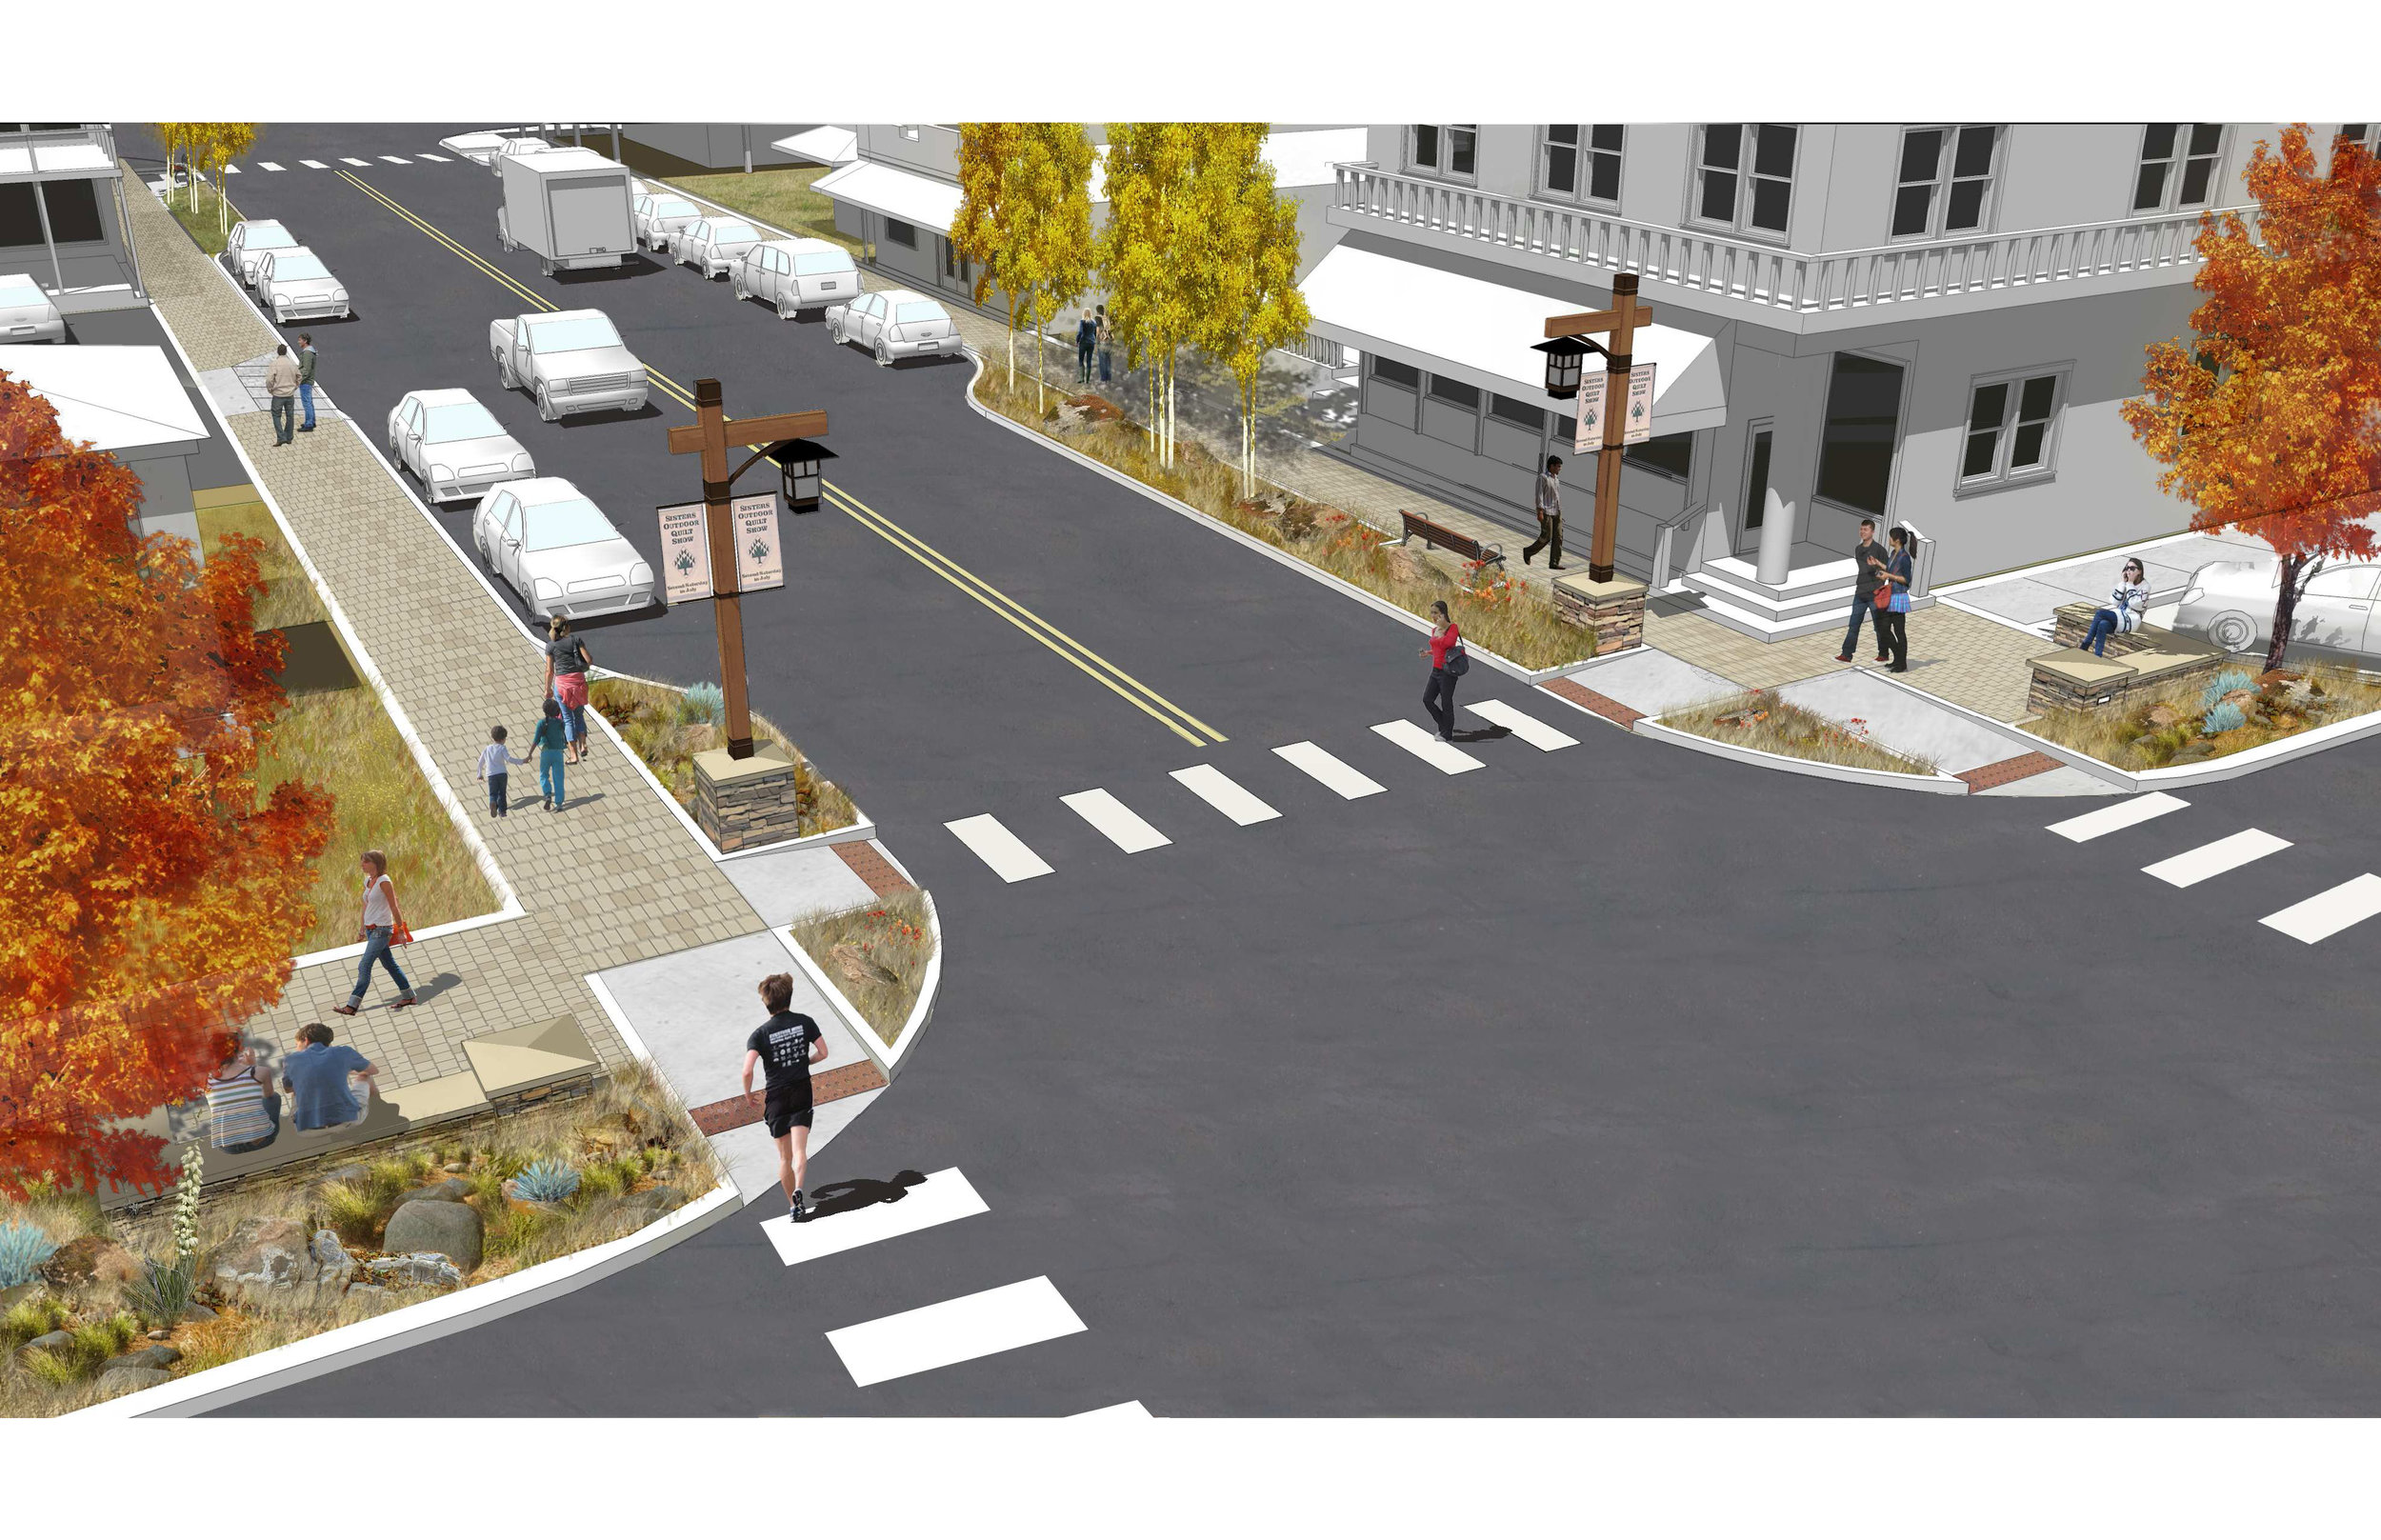 SistersCascadeAvenue_ Streetscape Model_2012_1016_asphalt_by_SERA.jpg